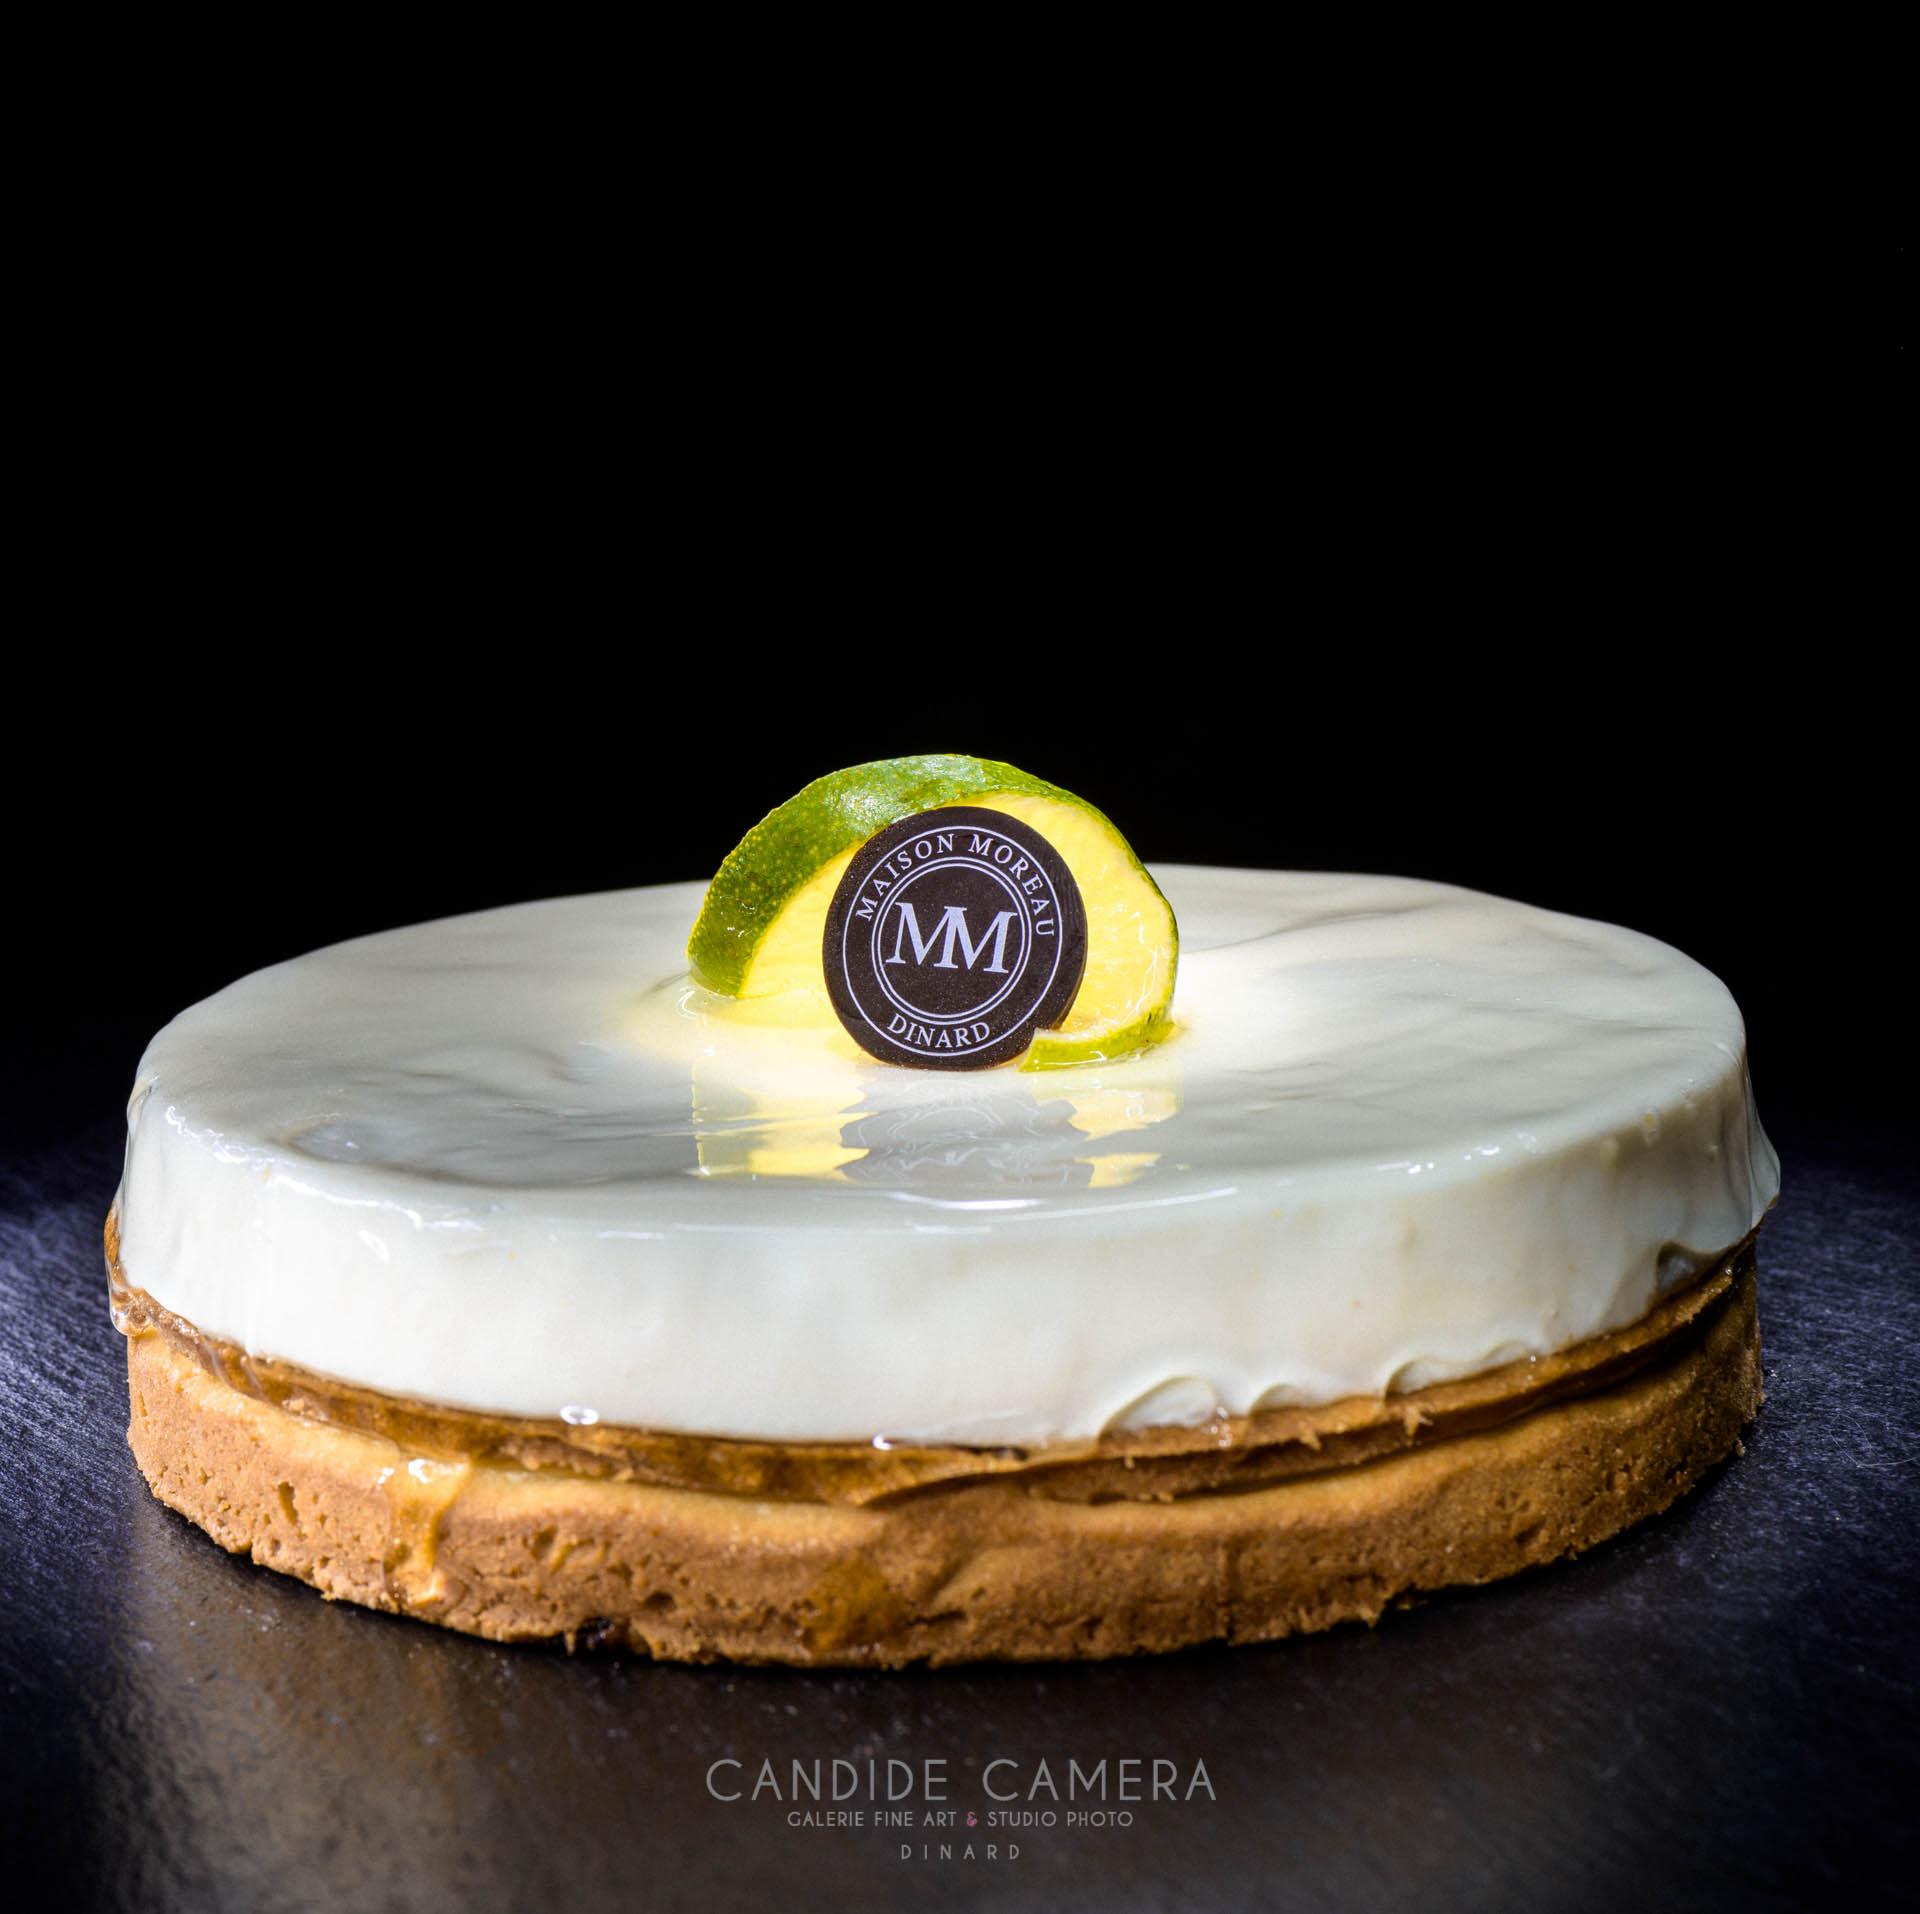 GALERIE_CANDIDE_CAMERA_PHOTOGRAPHE_DINARD Packshot pâtisserie